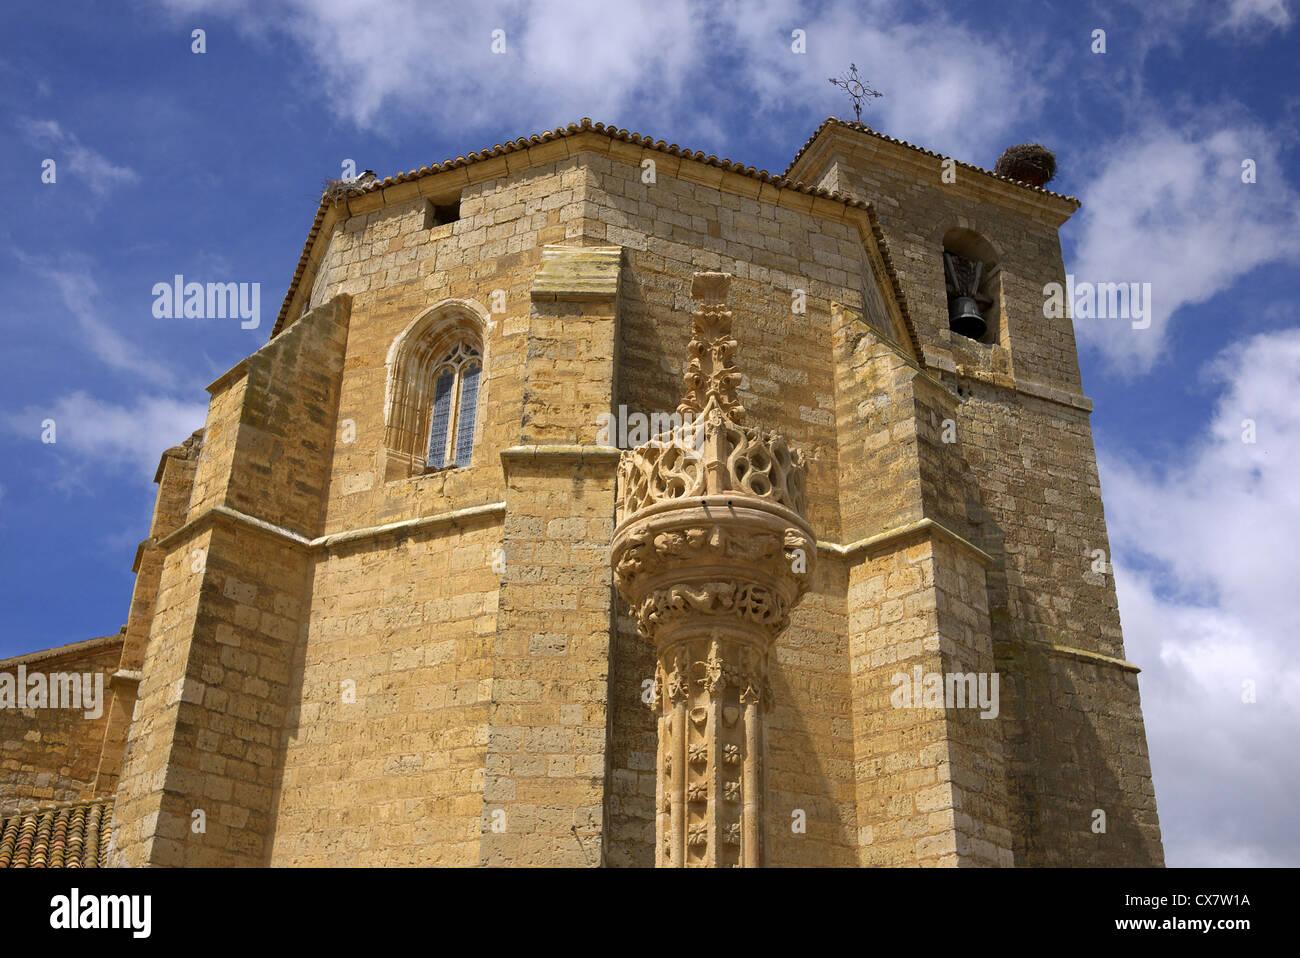 The Church Of Santa Maria And Jurisdictional Cross In